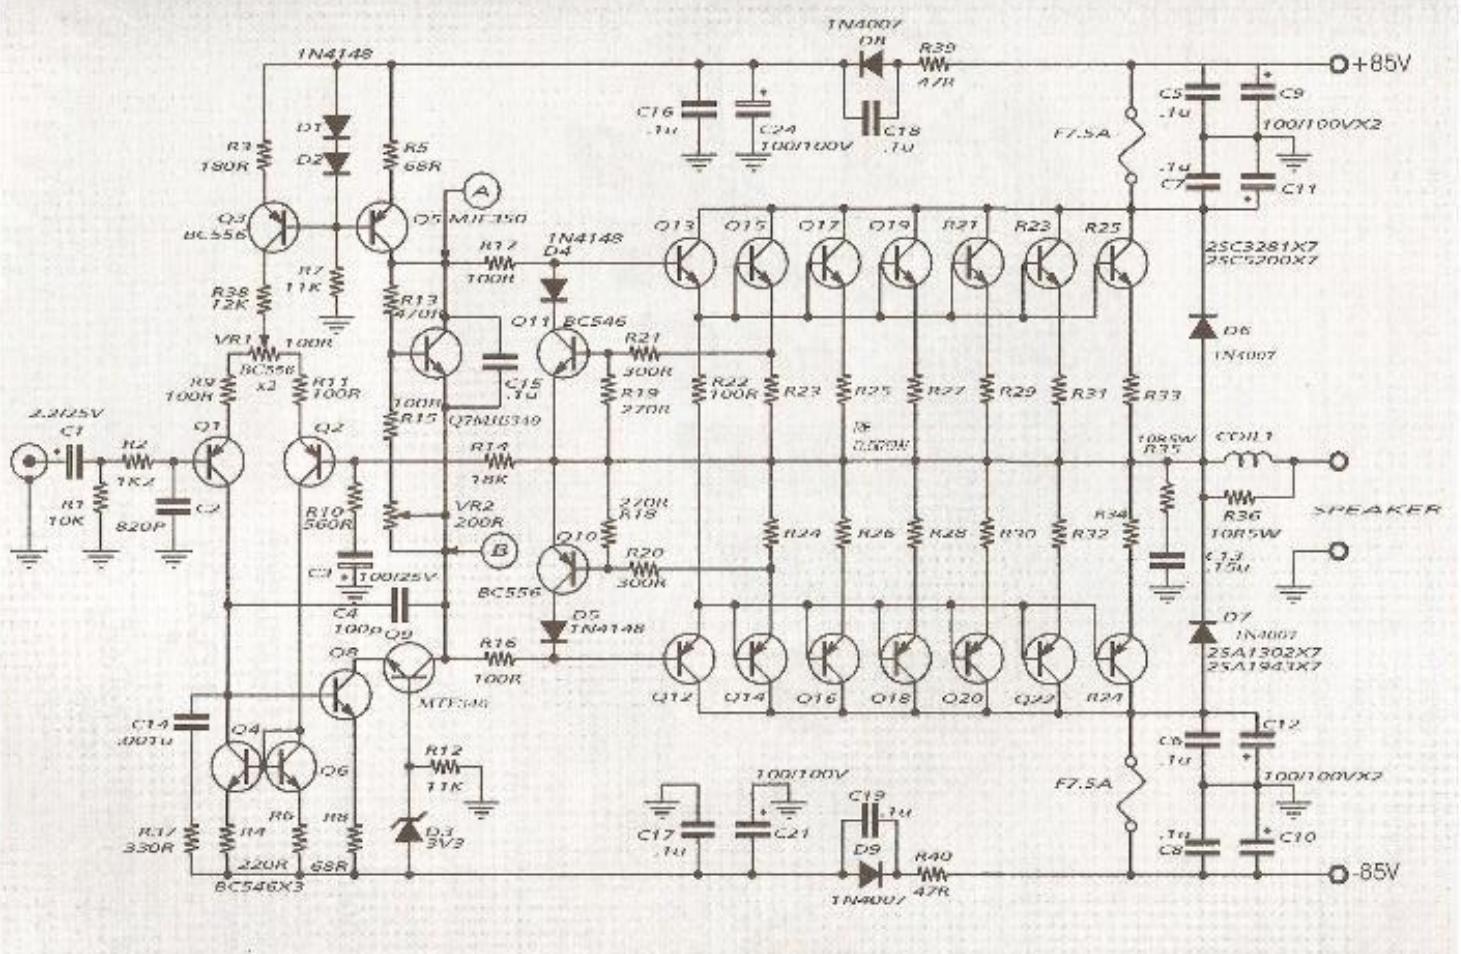 medium resolution of yamaha amp schematic wiring diagram list mix yamaha amp schematic advance wiring diagram yamaha jx20 amp